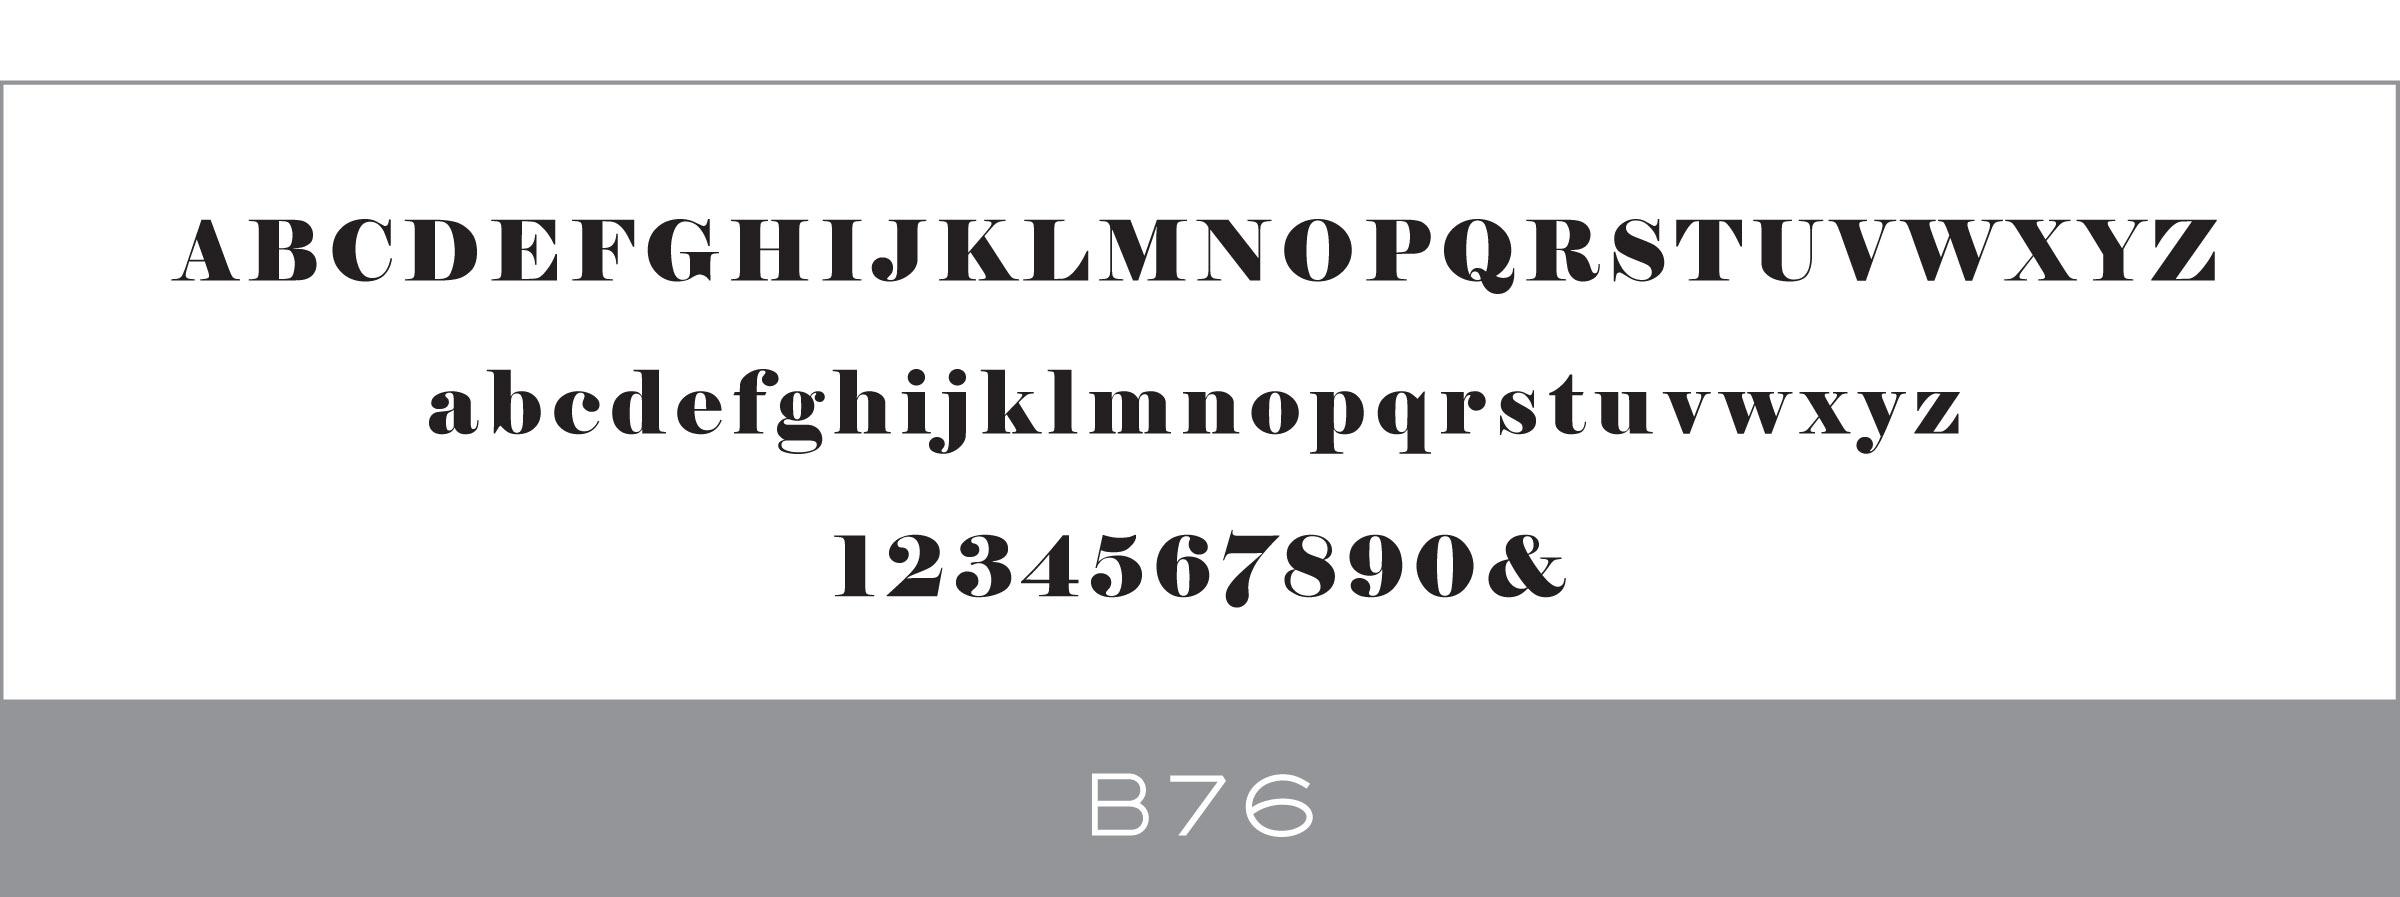 B76_Haute_Papier_Font.jpg